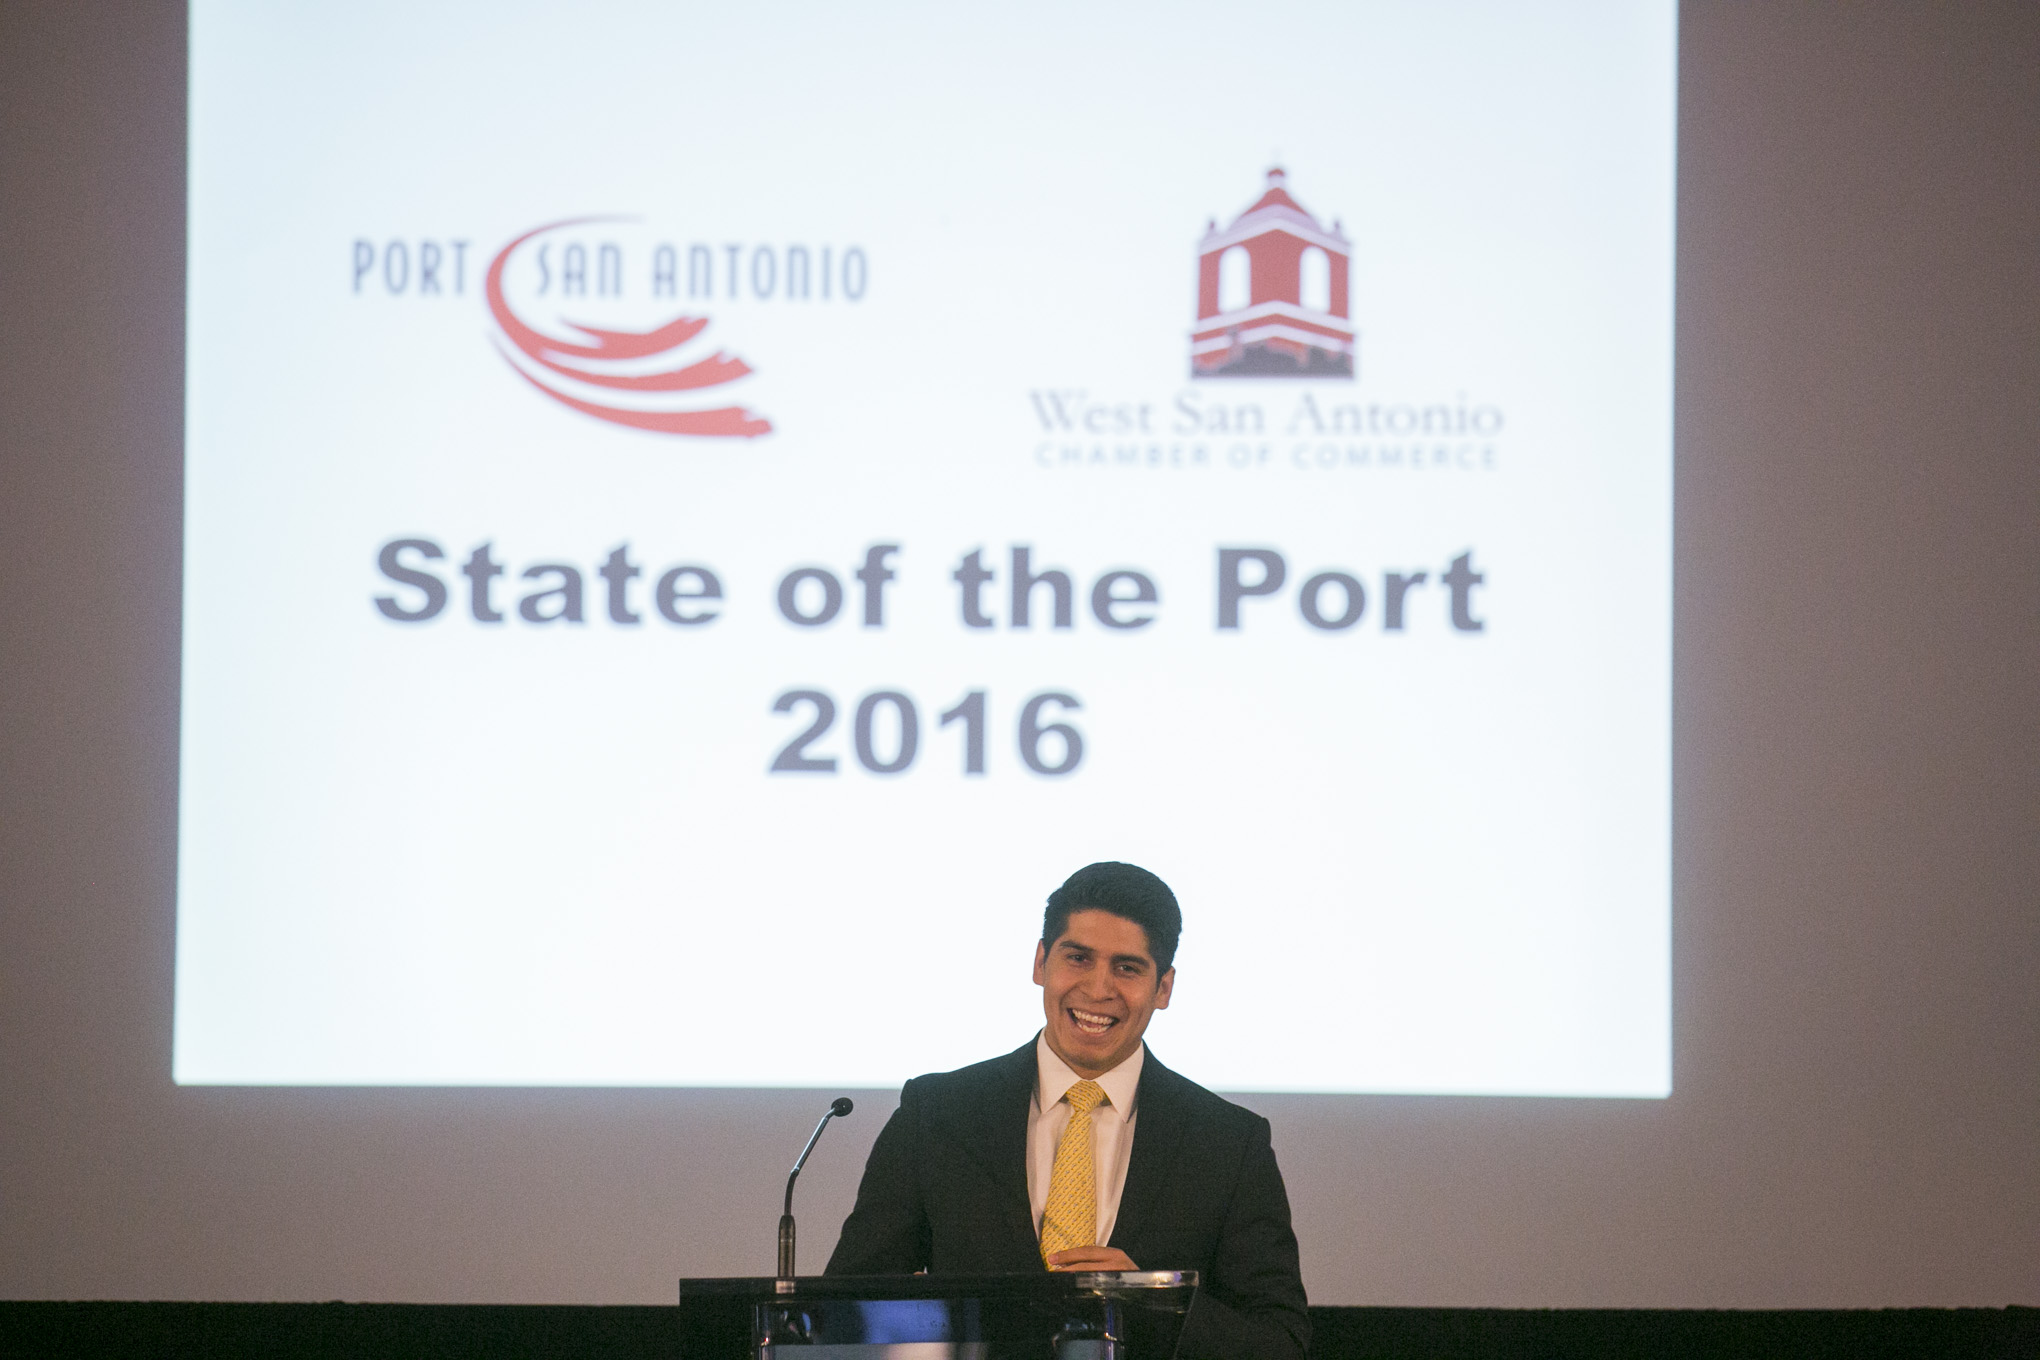 Councilman Rey Saldana introduces Port San Antonio CEO Rowland Mower. Photo by Kathryn Batstone-Boyd.